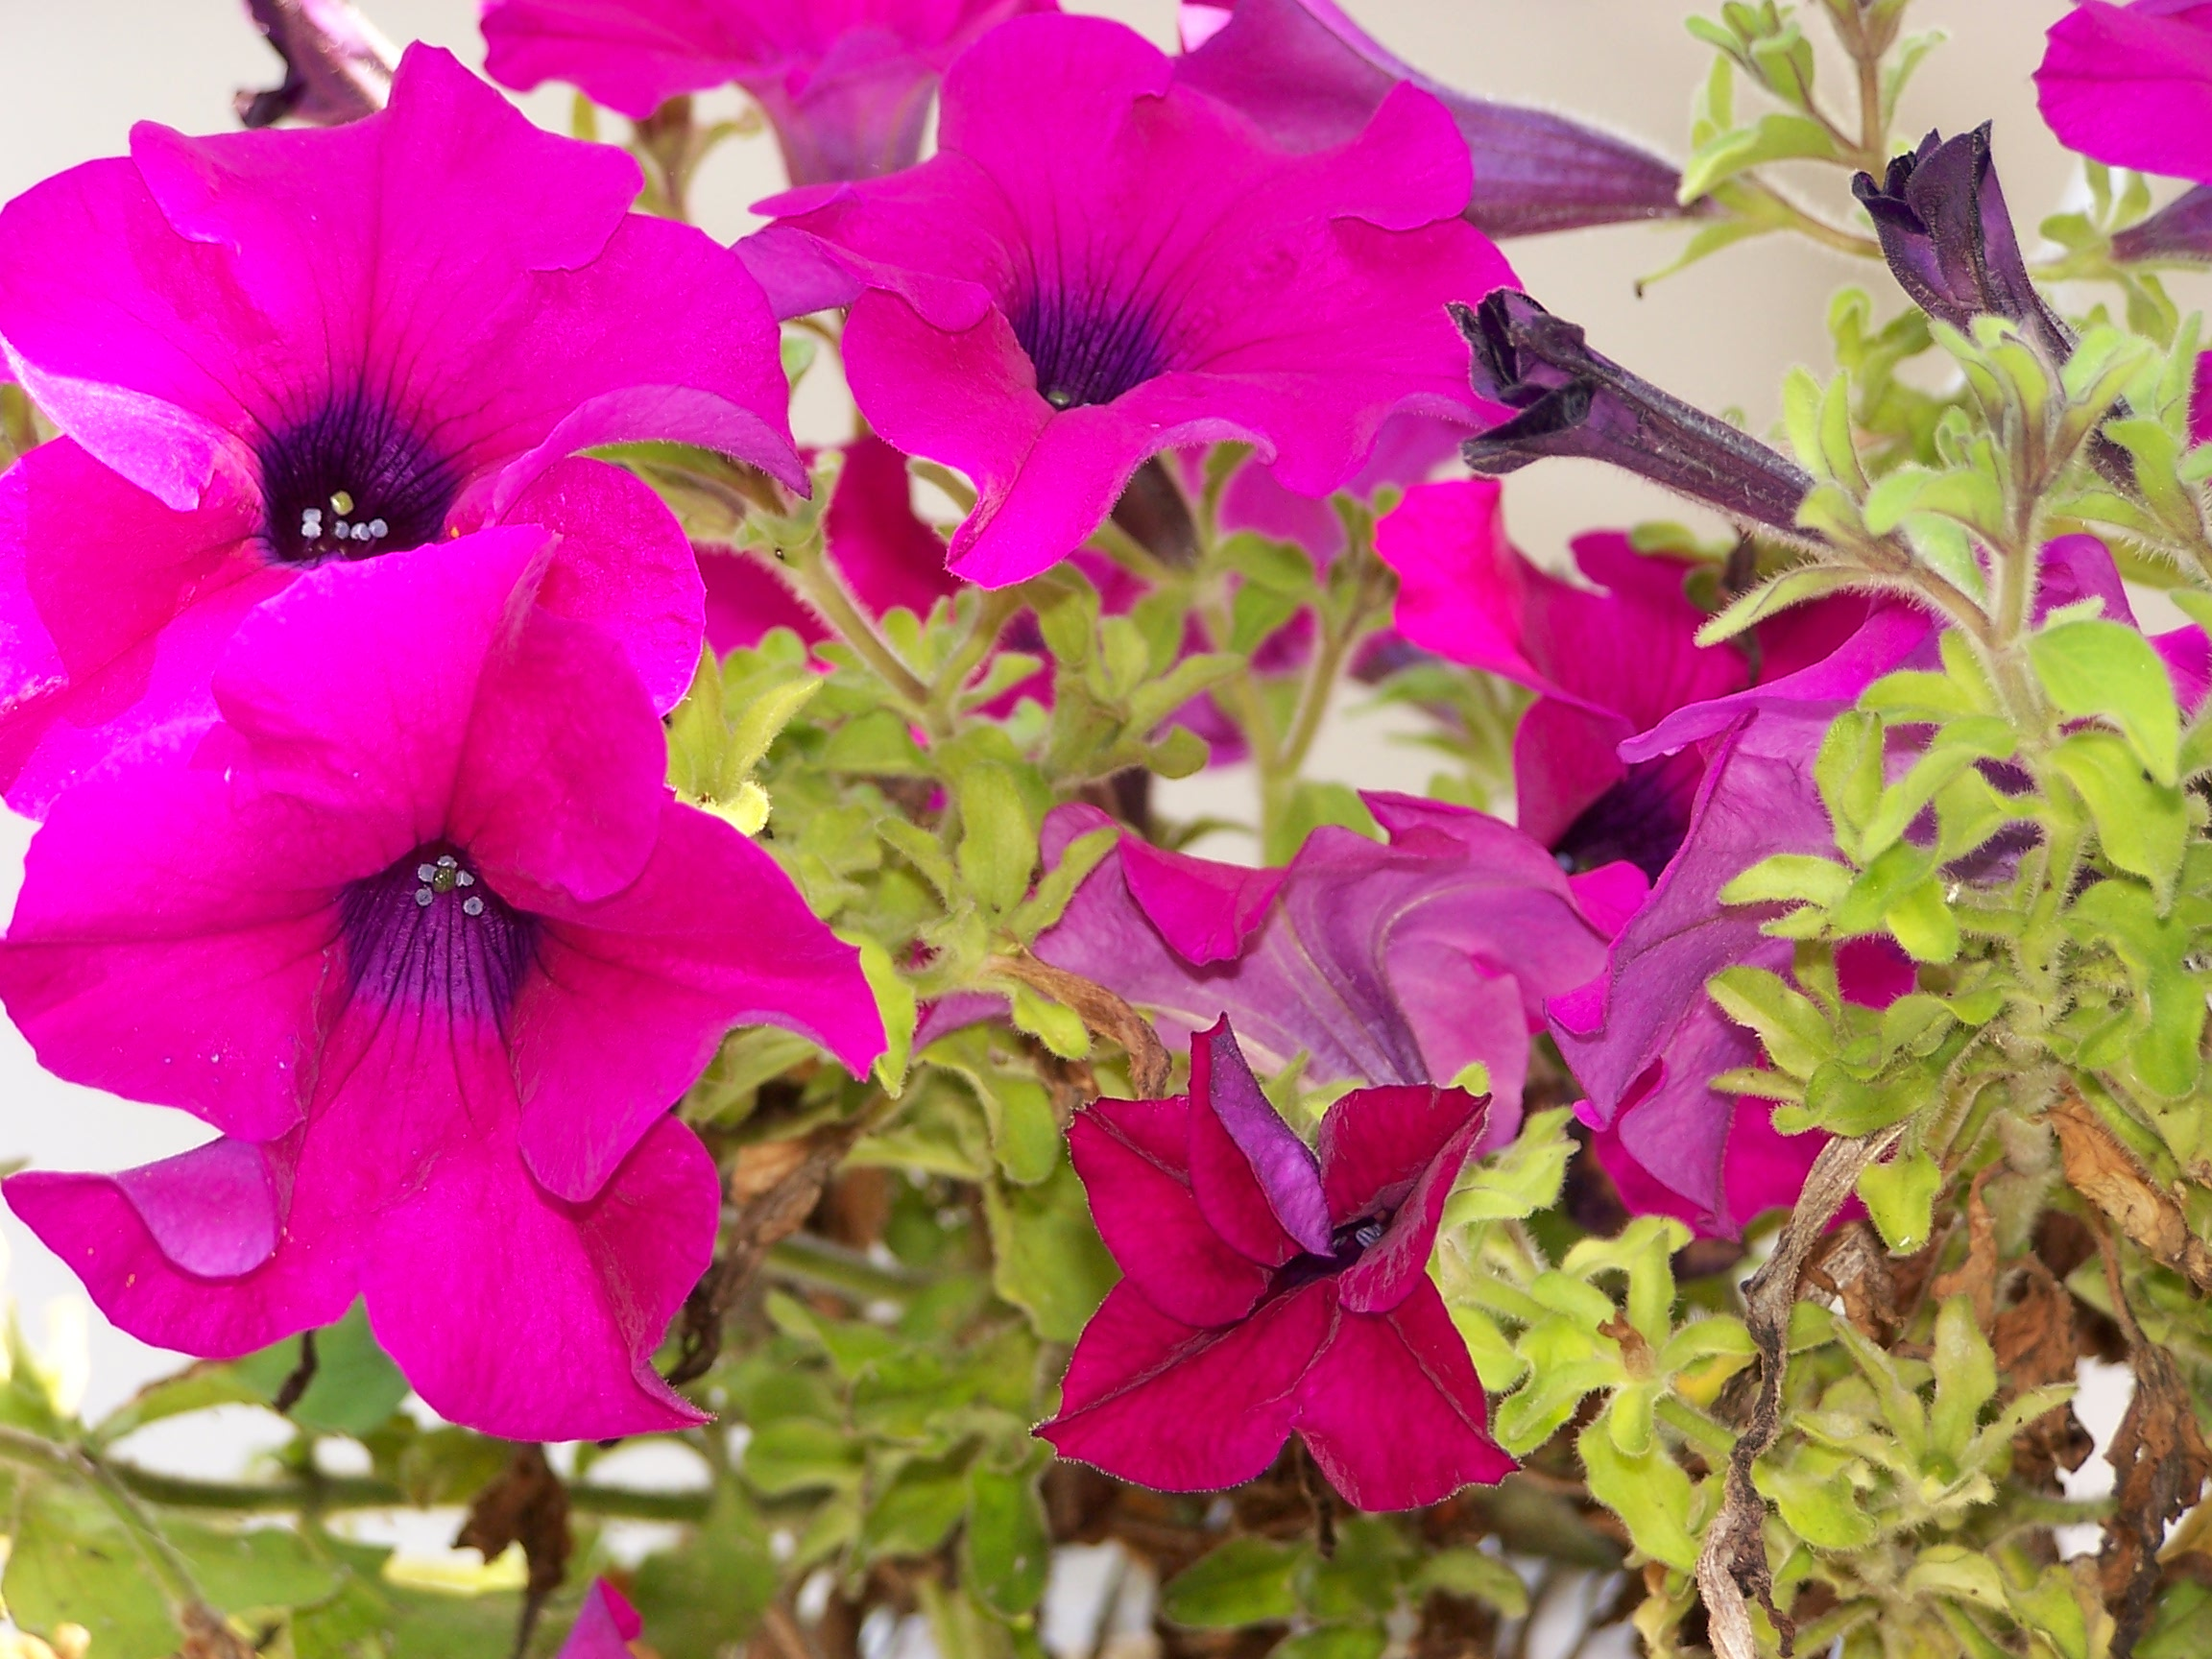 File:Petunia Hybrida 01.JPG